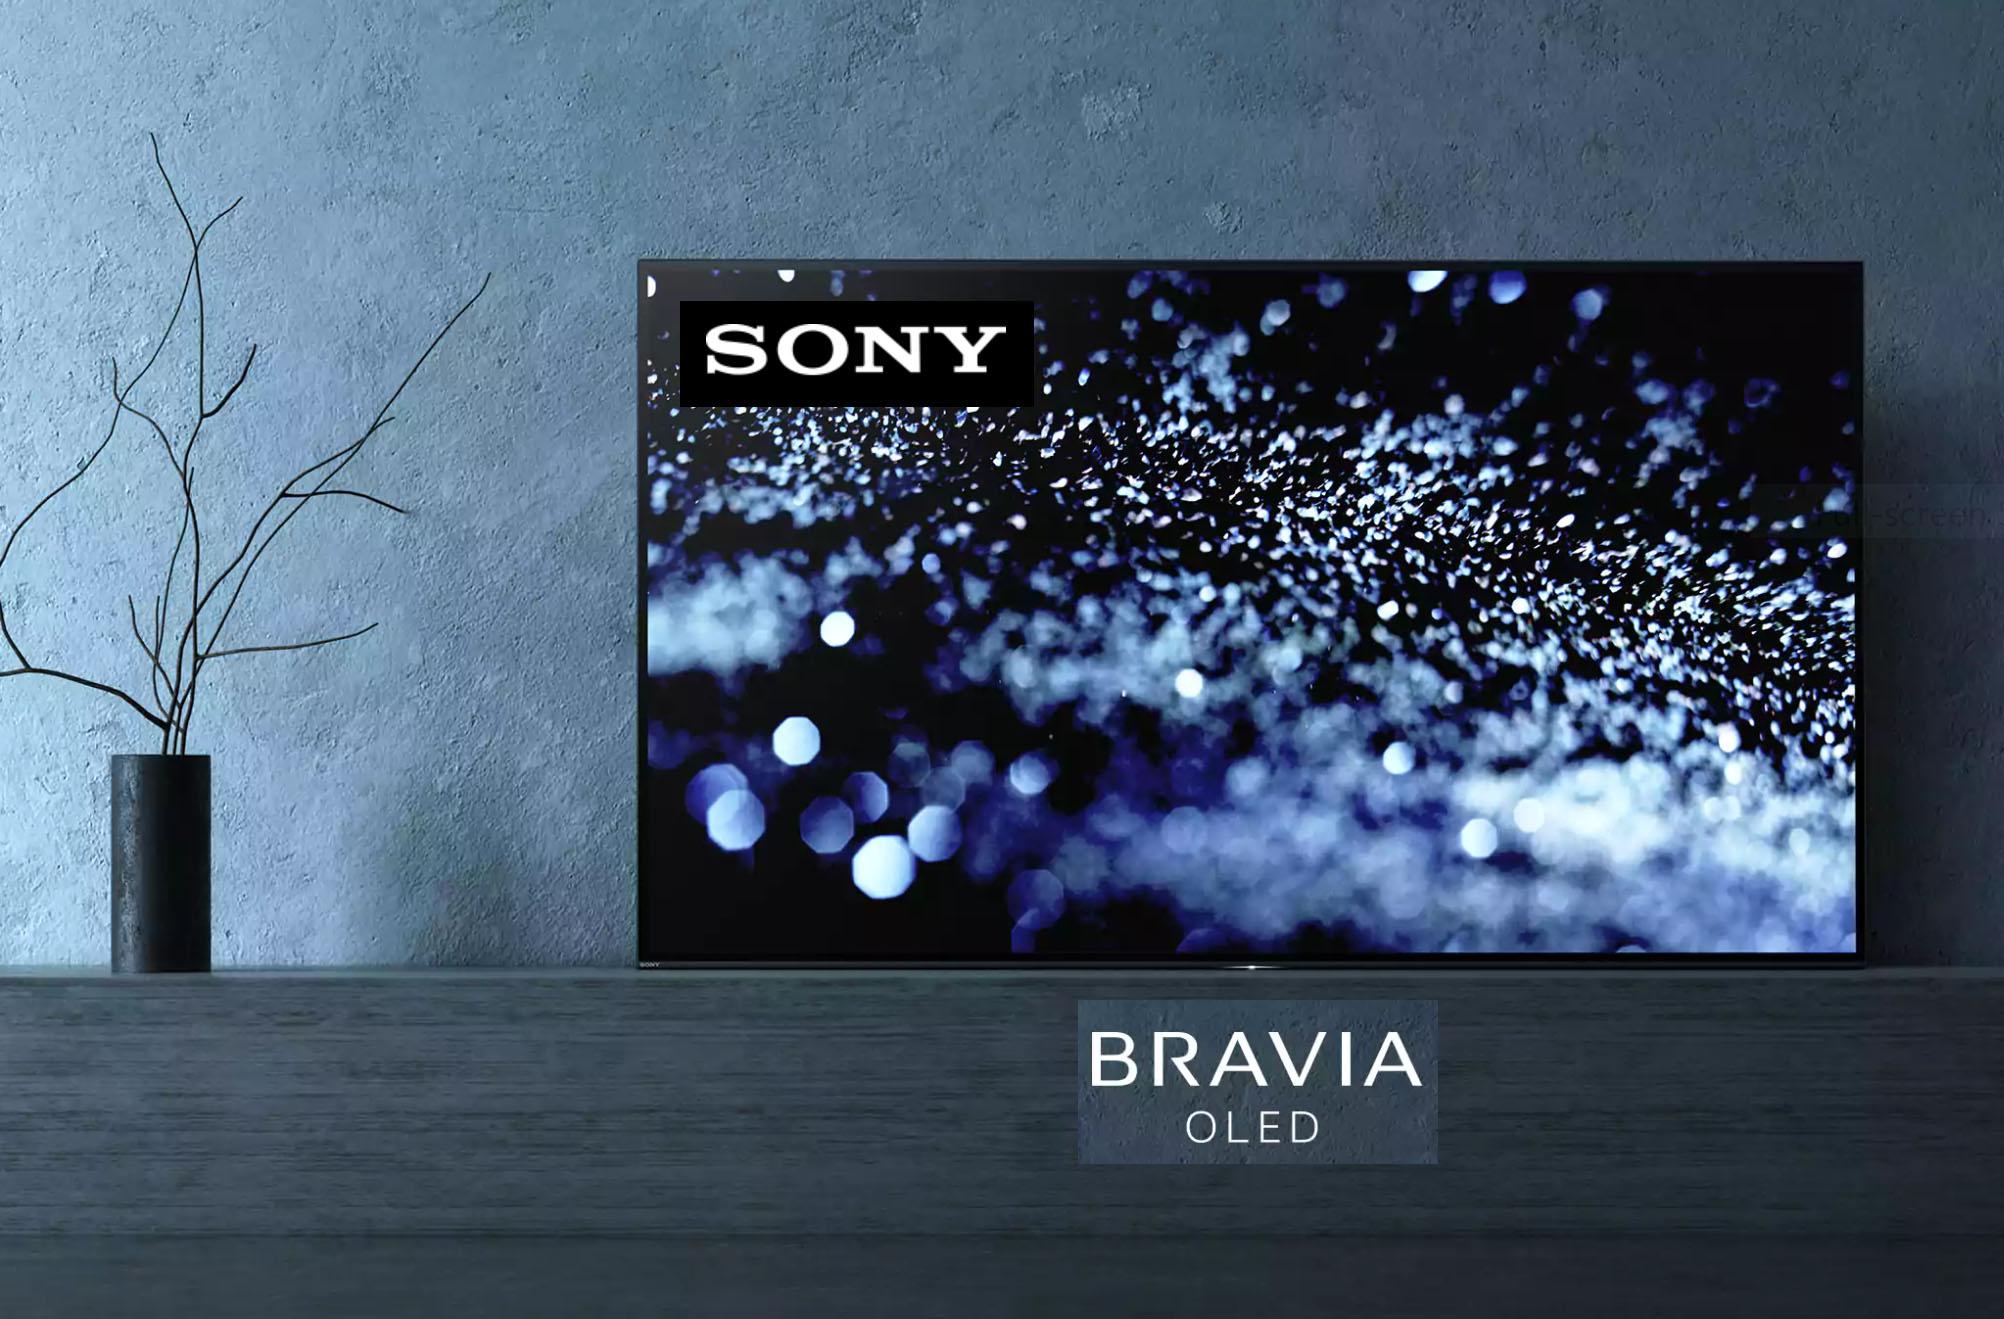 Buy Sony TVs San Diegho La Jolla